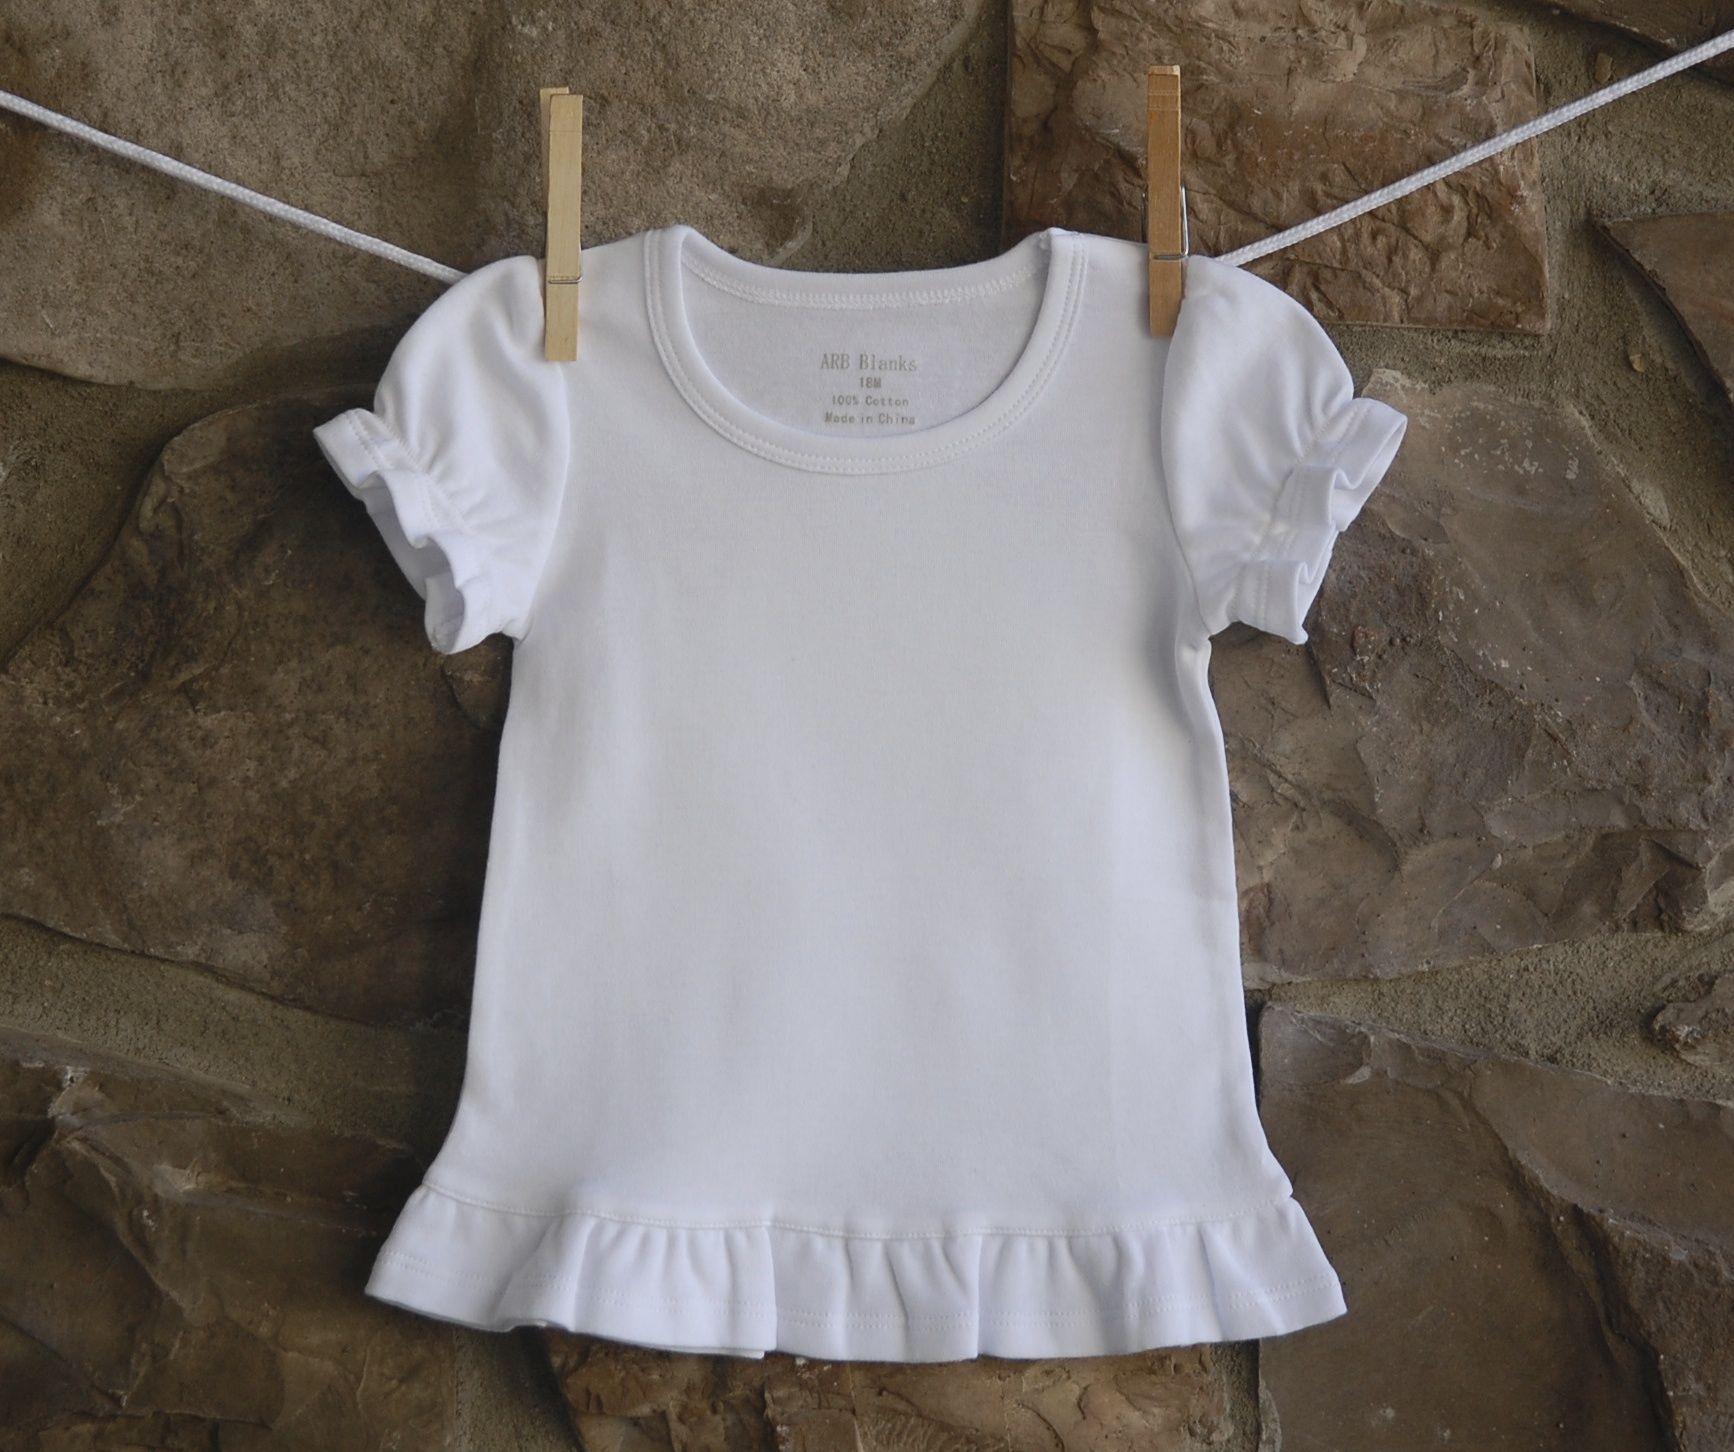 Arb Blanks Ruffle Shirts Arb Blanks Products Pinterest